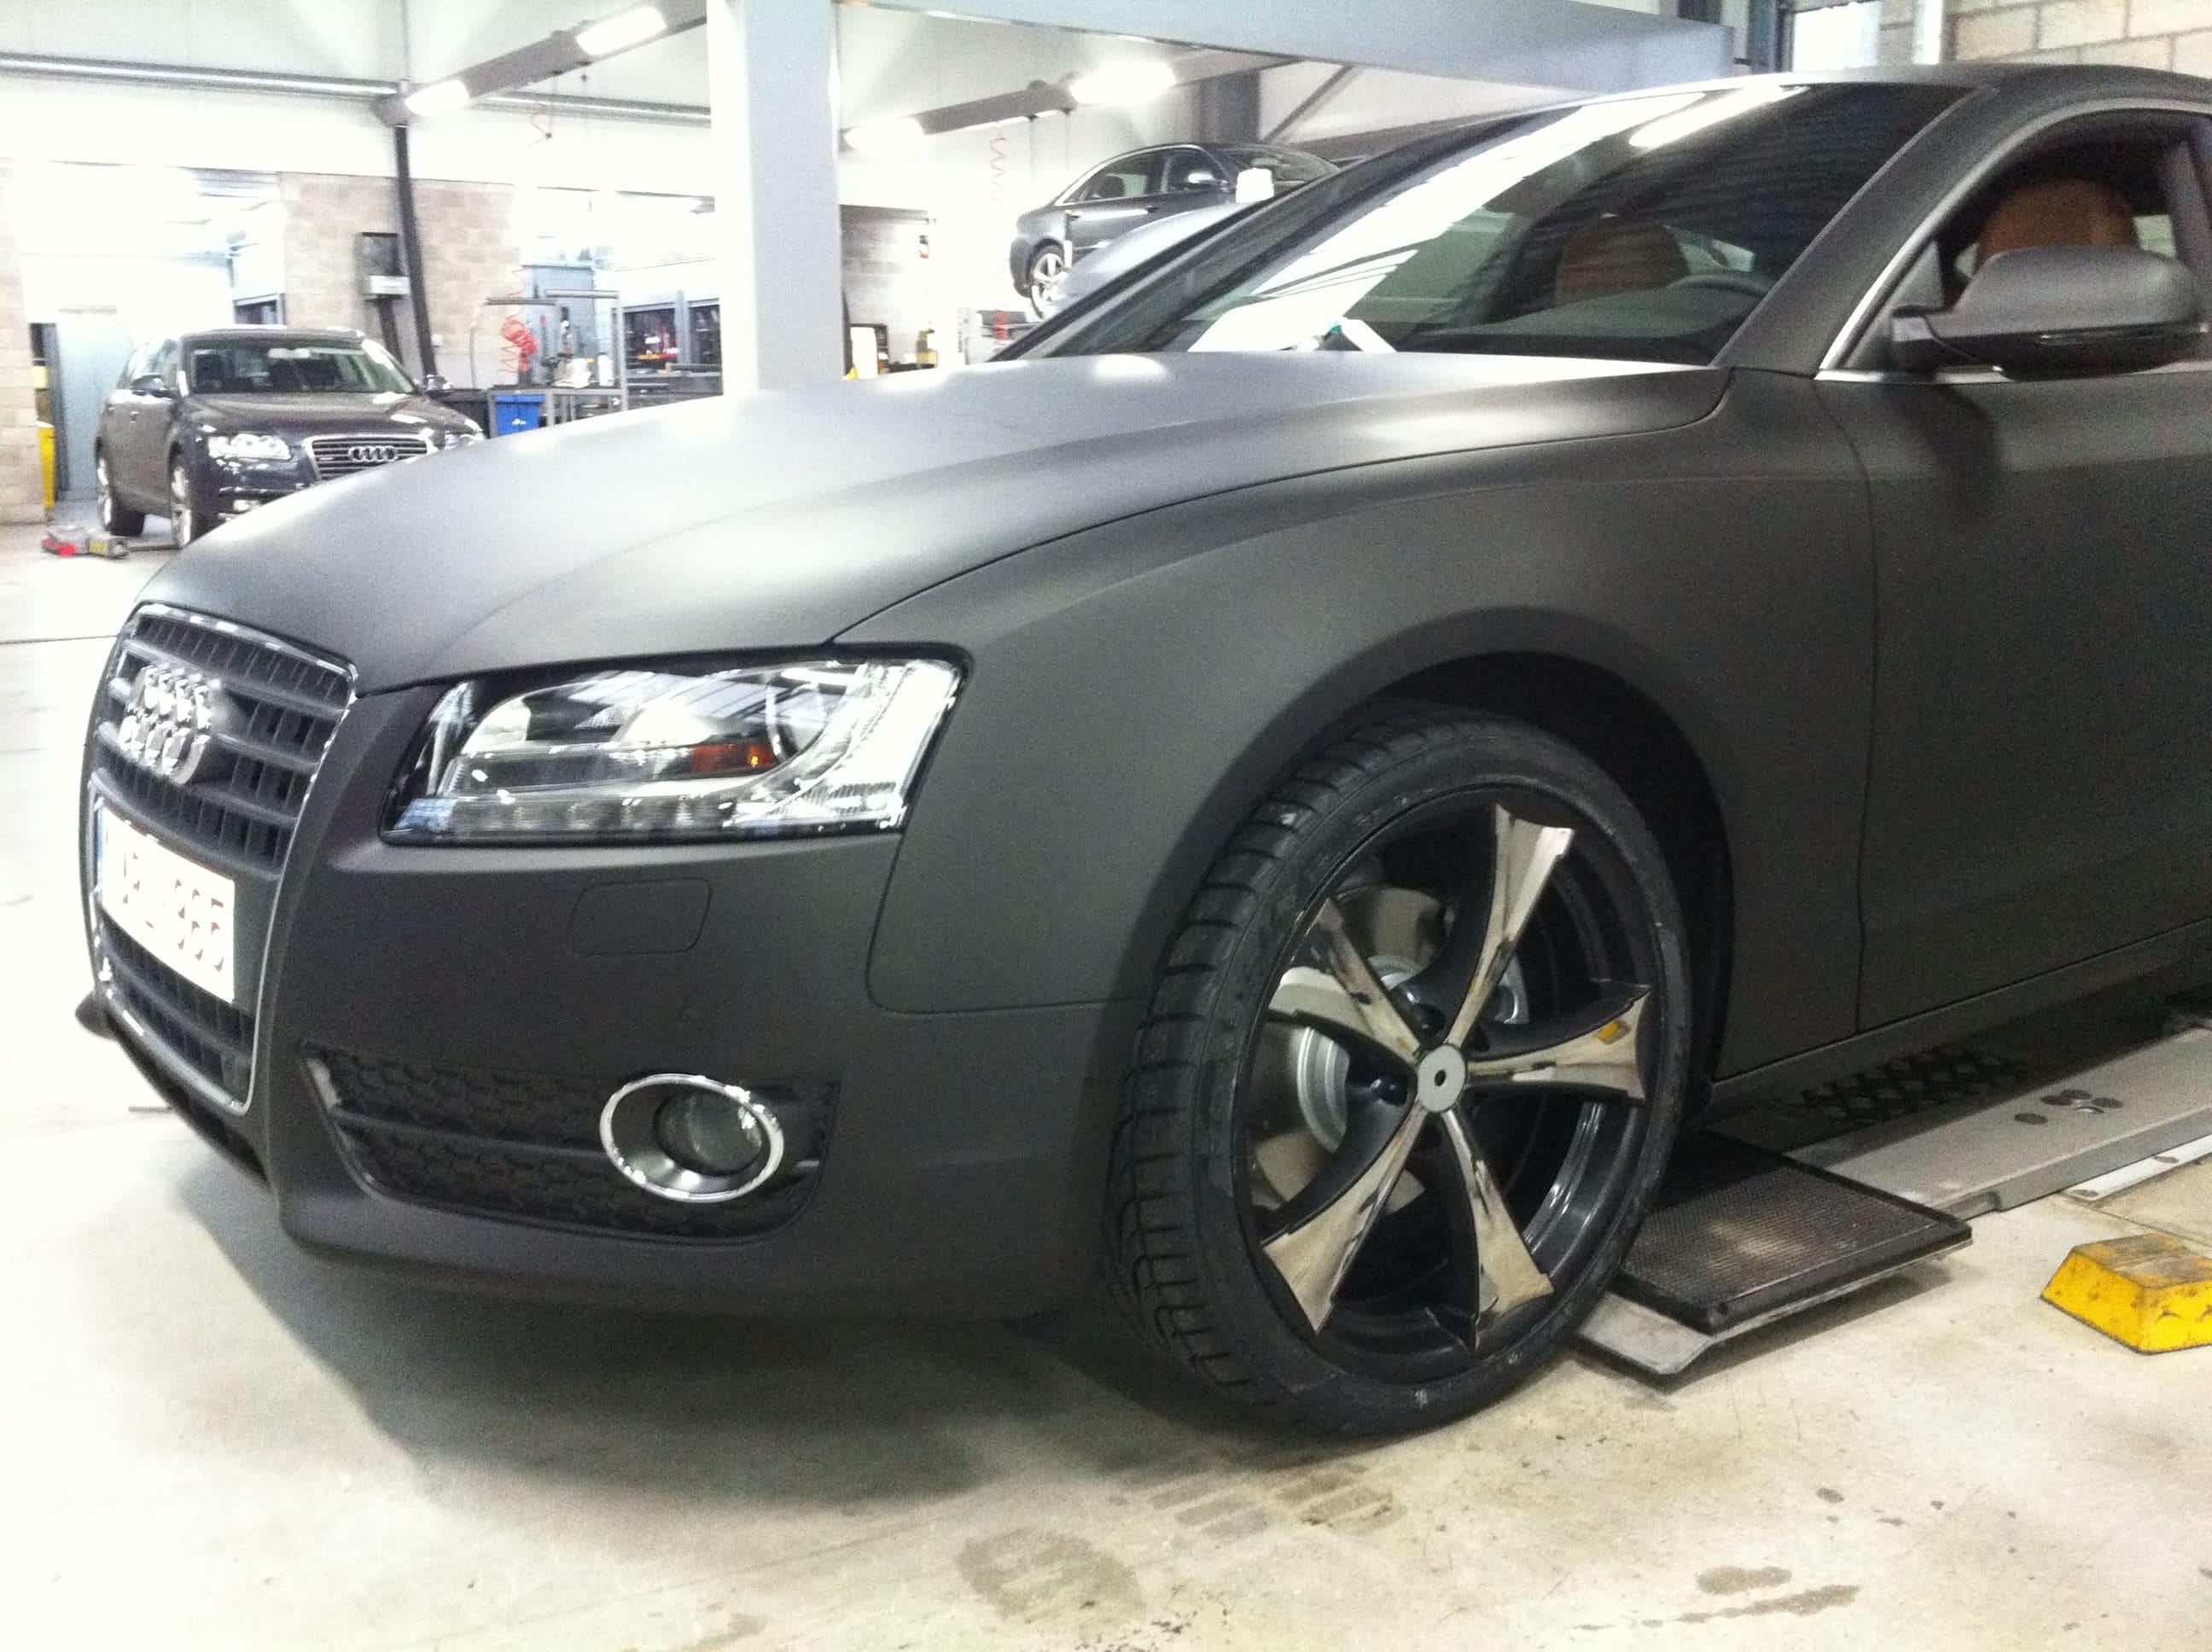 Audi A5 Sportback met Mat Grijze Wrap, Carwrapping door Wrapmyride.nu Foto-nr:4802, ©2021